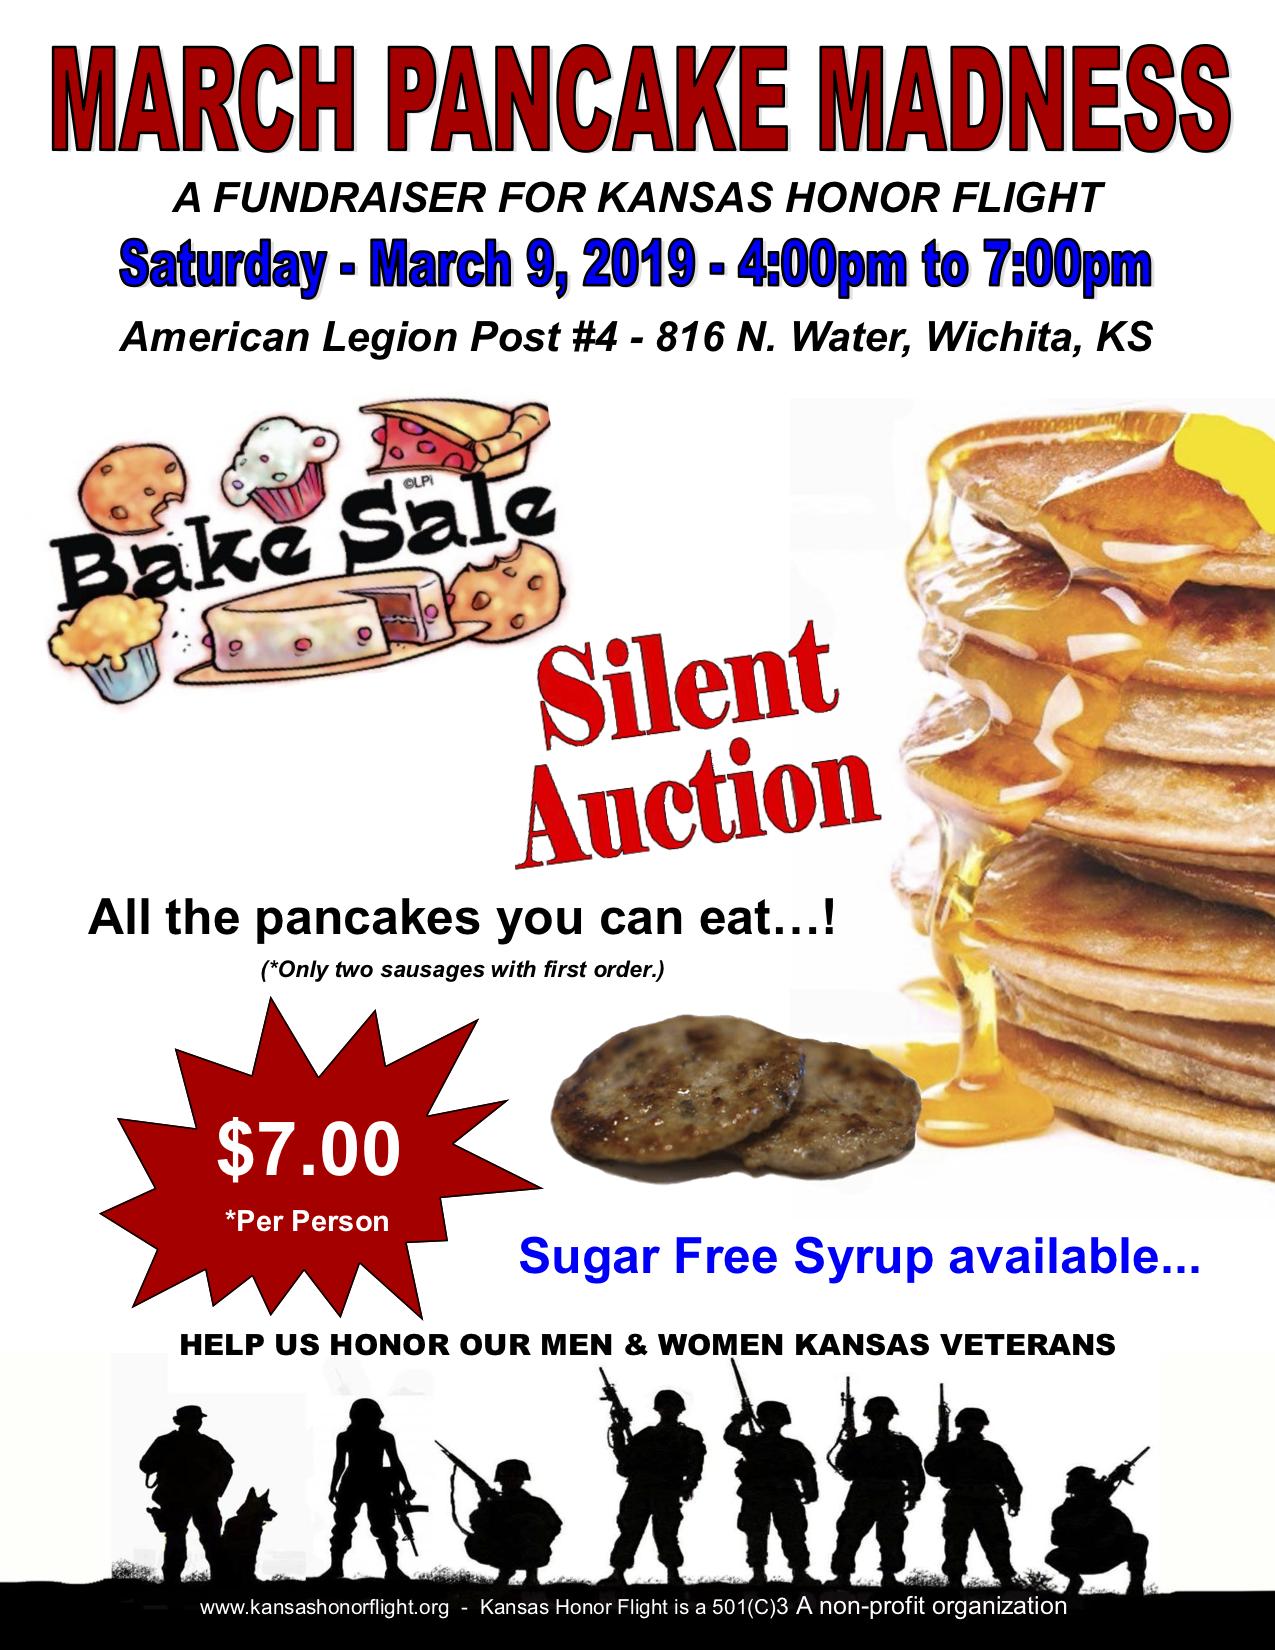 March Pancake Madness Fundraiser for Kansas Honor Flight